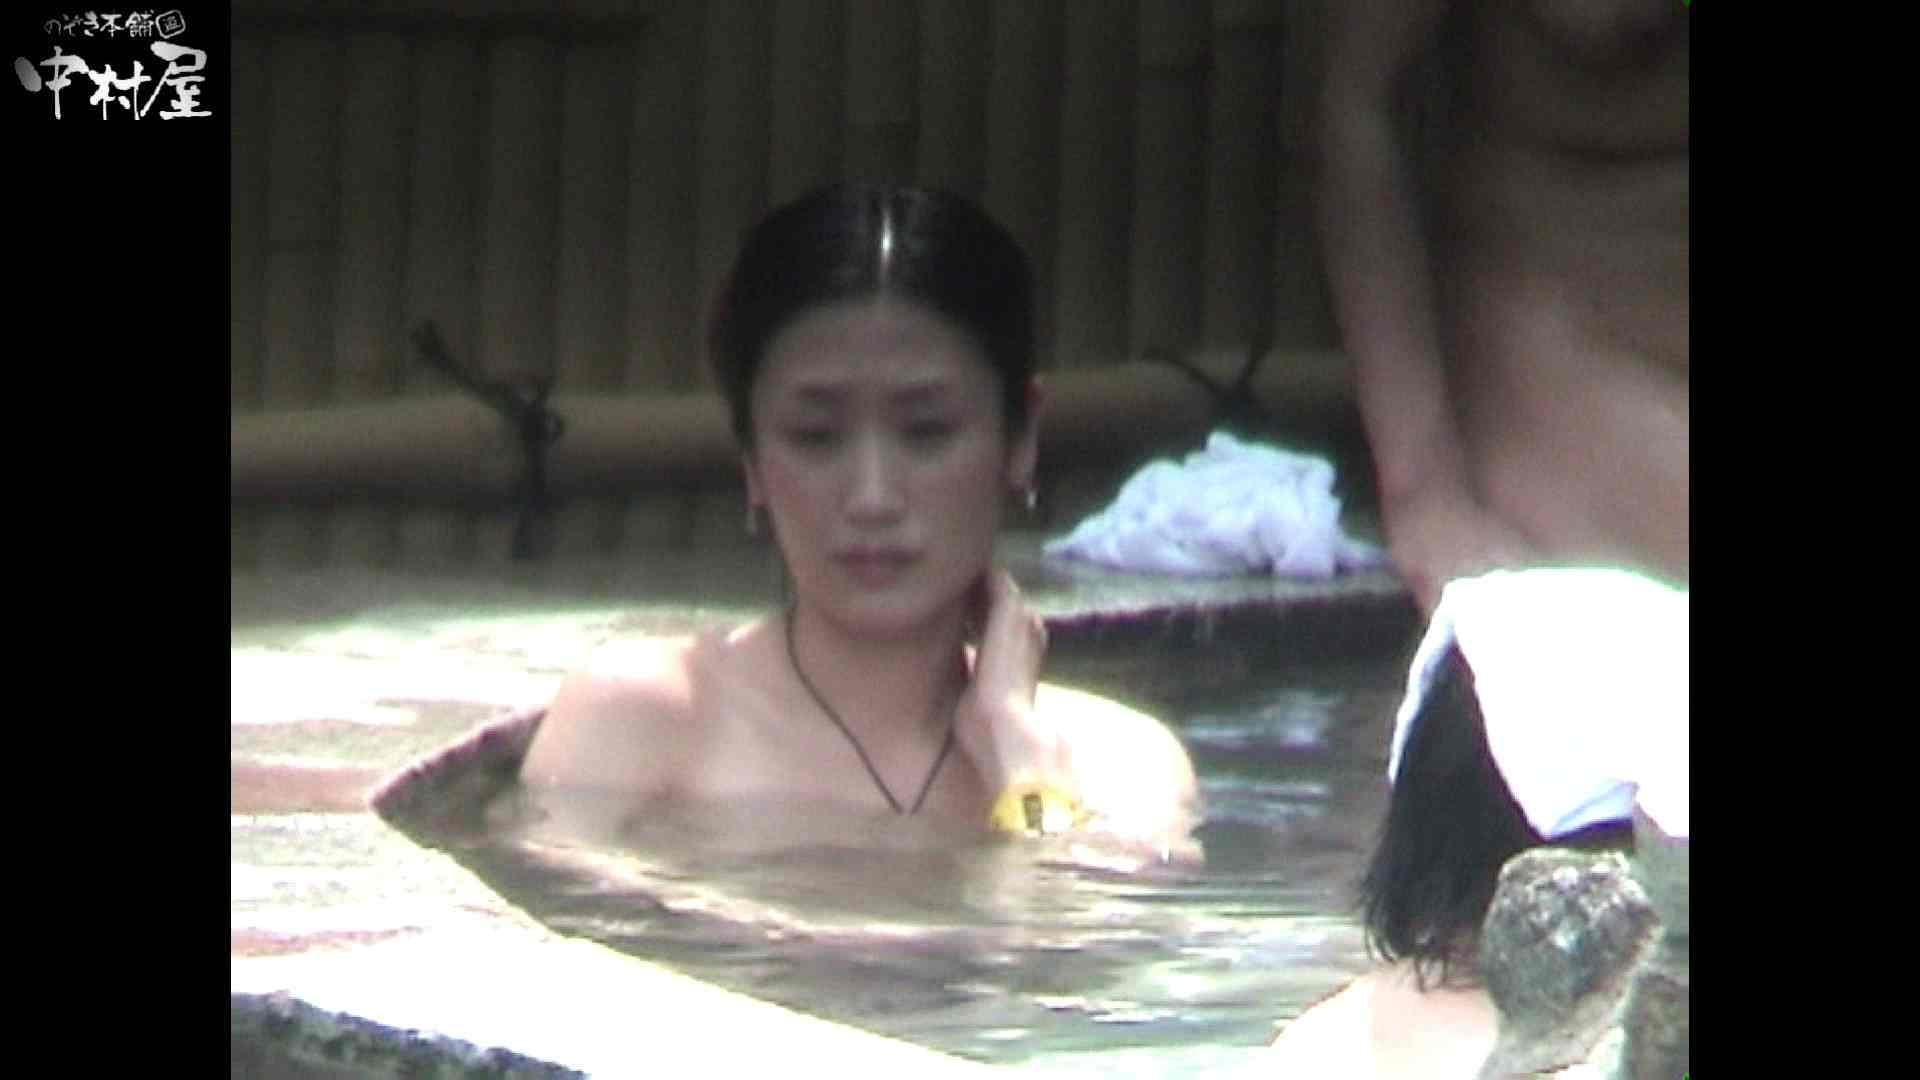 Aquaな露天風呂Vol.934 OLセックス  66画像 24